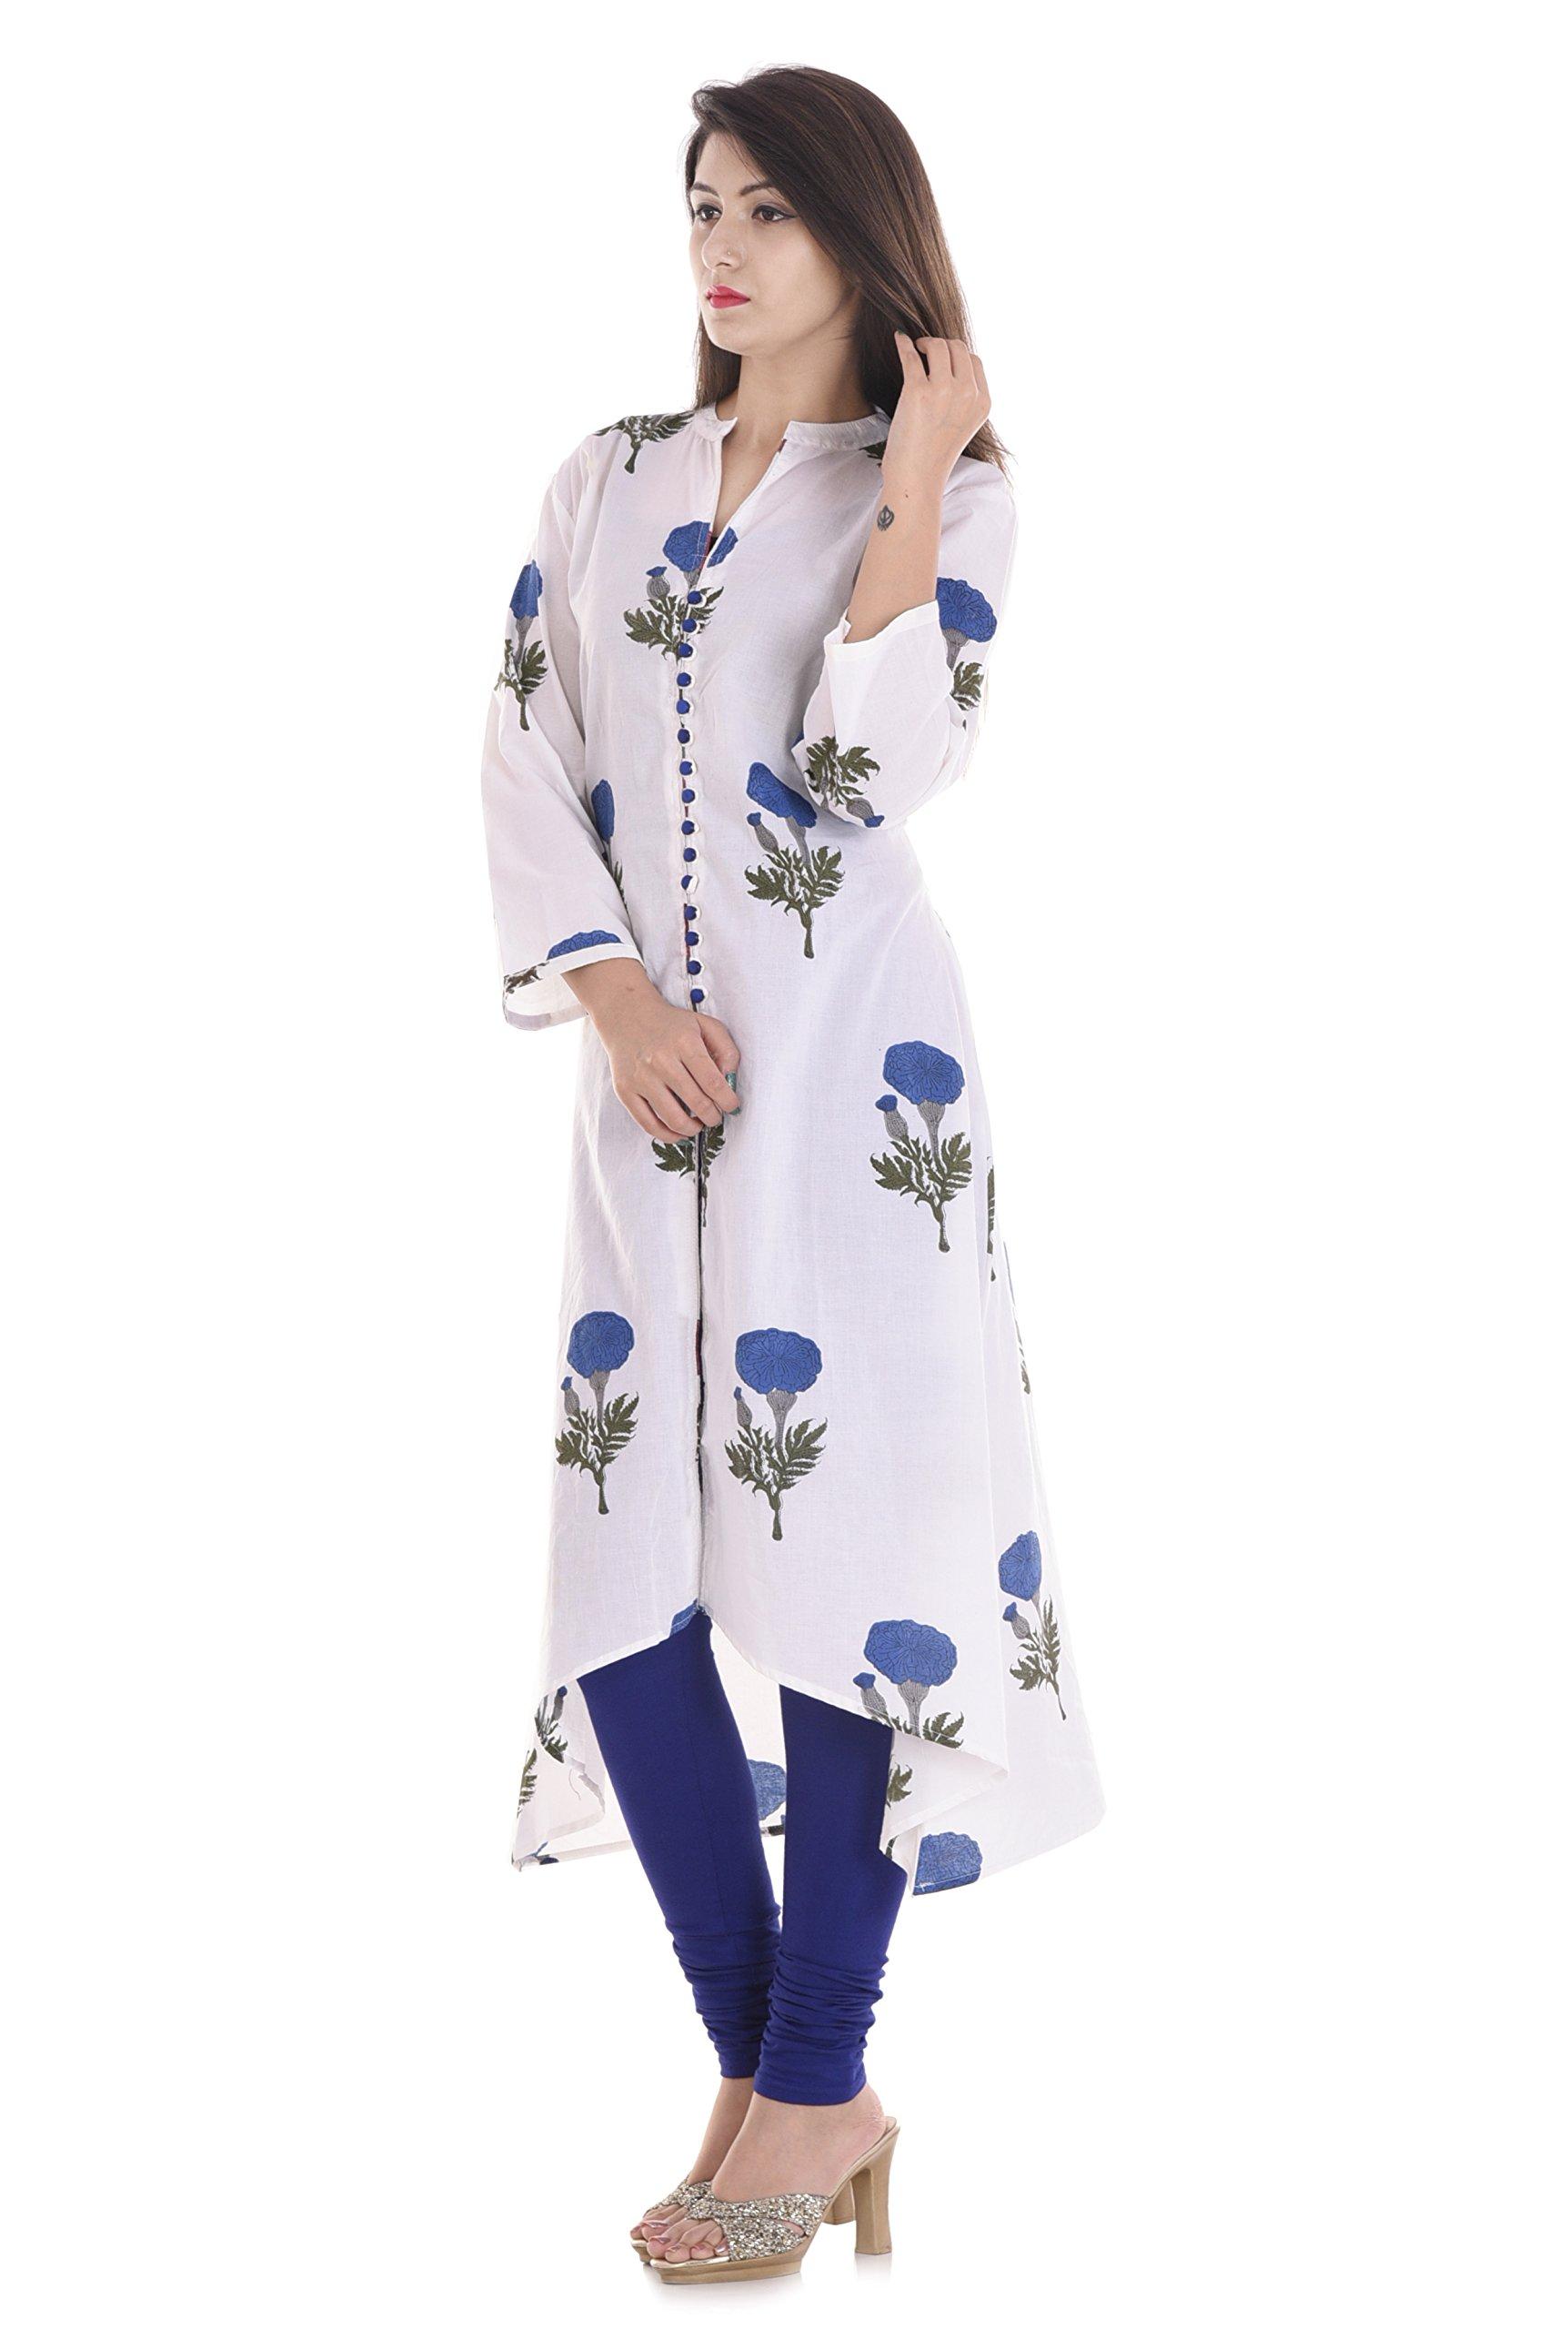 Jewel Fab art Women's 100% Cotton Floral Print White Straight Kurti Summer Kurti